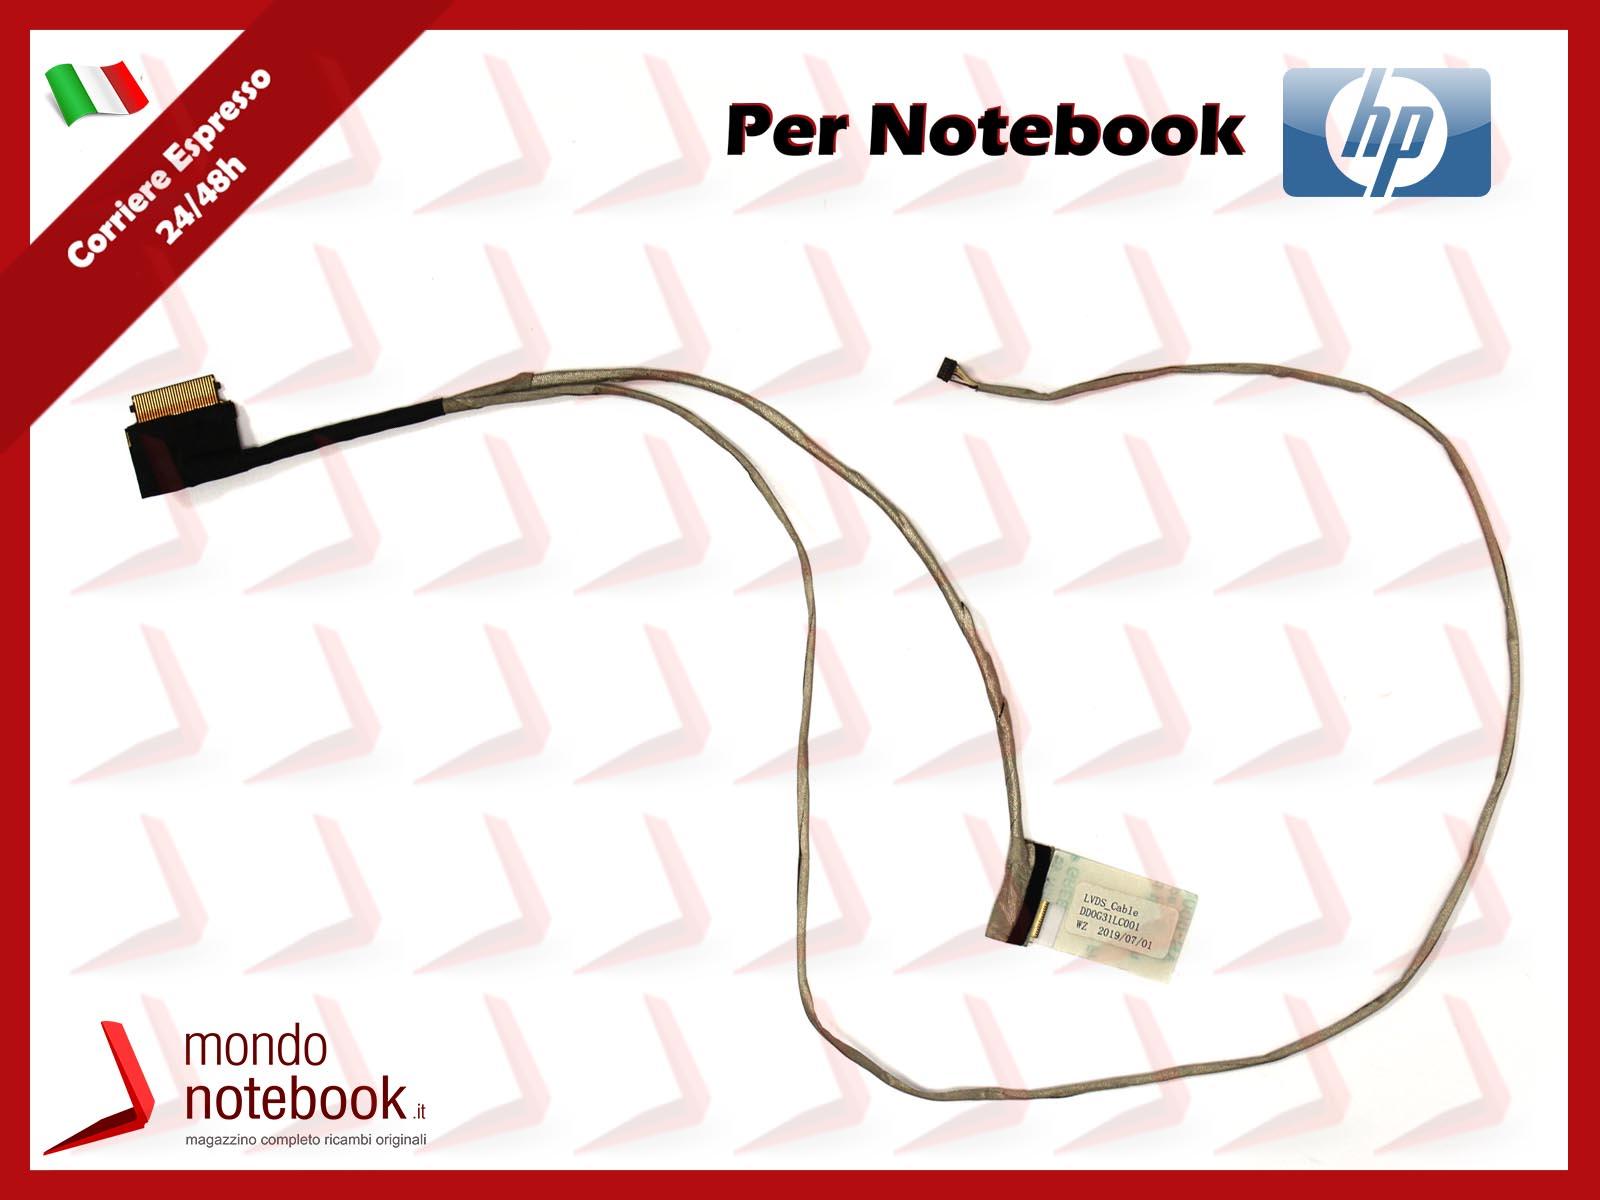 https://www.mondonotebook.it/6091/cavo-flat-cable-wifi-apple-a1286-2011-2012-mc721-723-md318.jpg